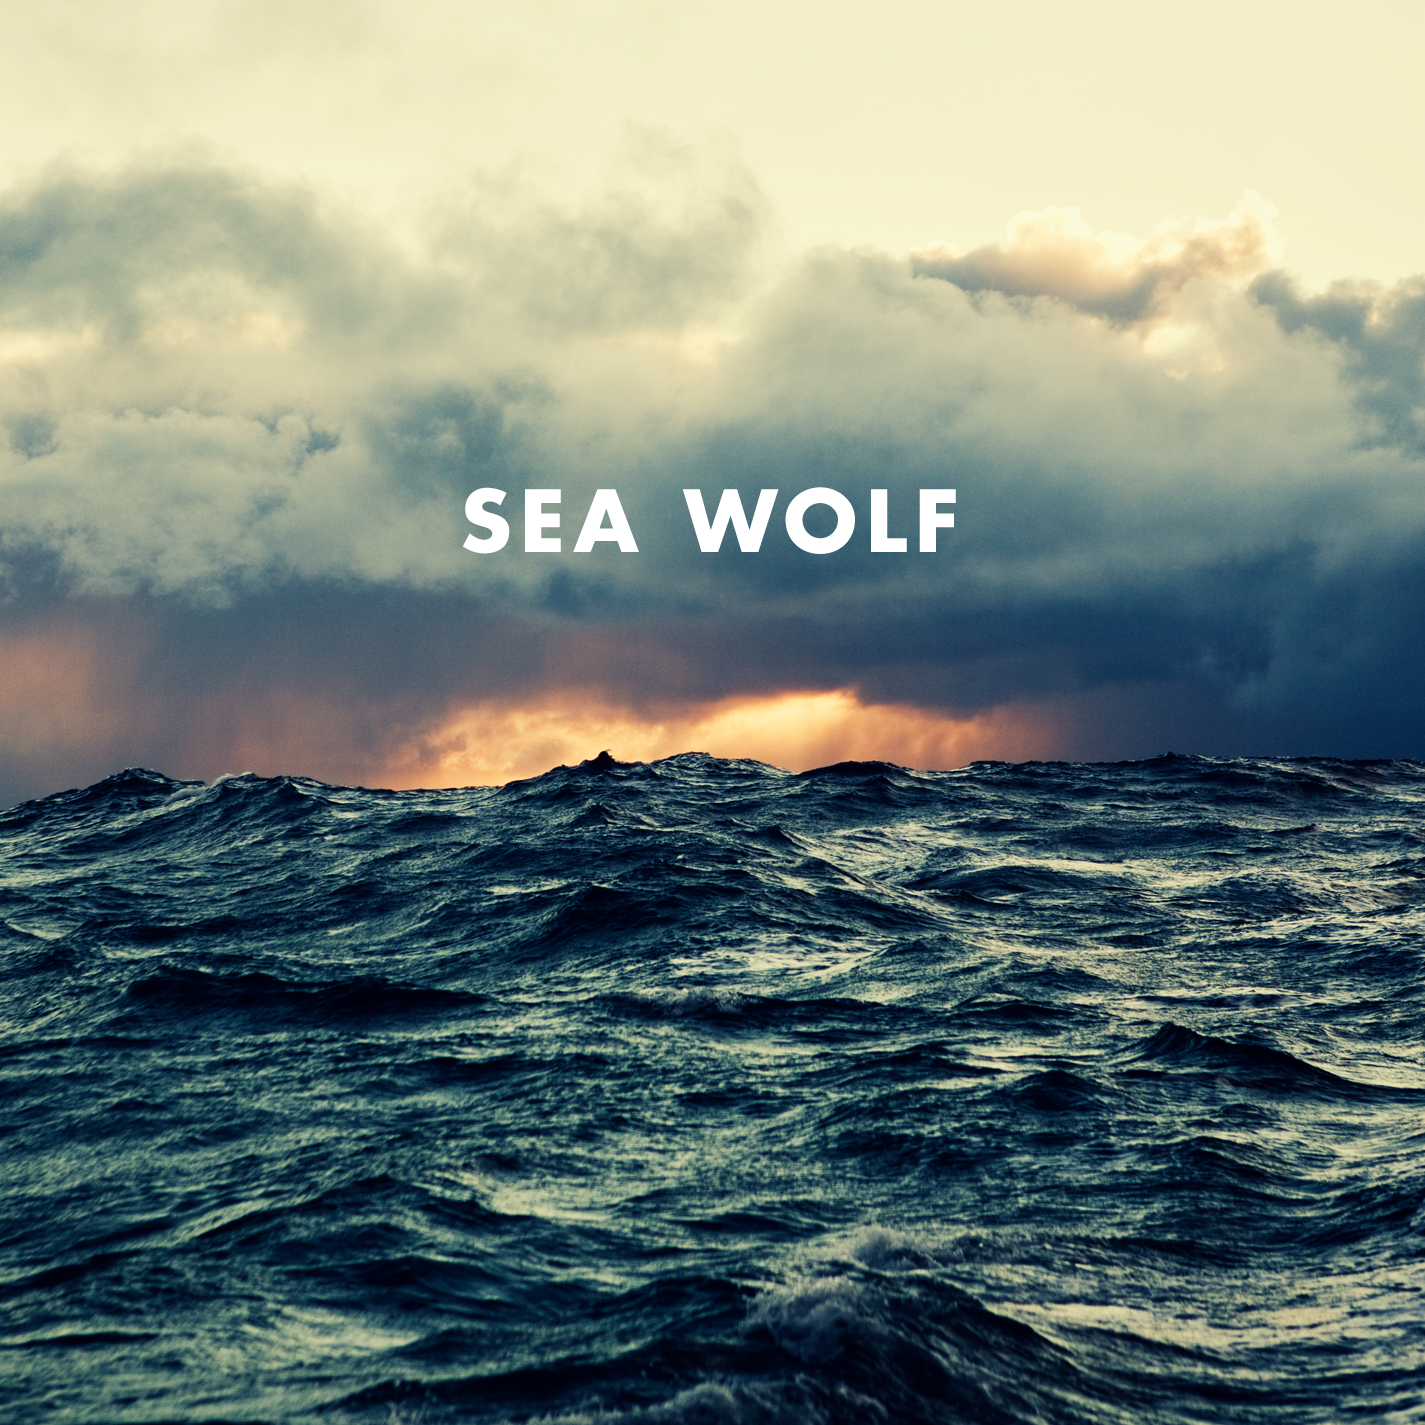 Sea Wolf - Old World Romance - Digital